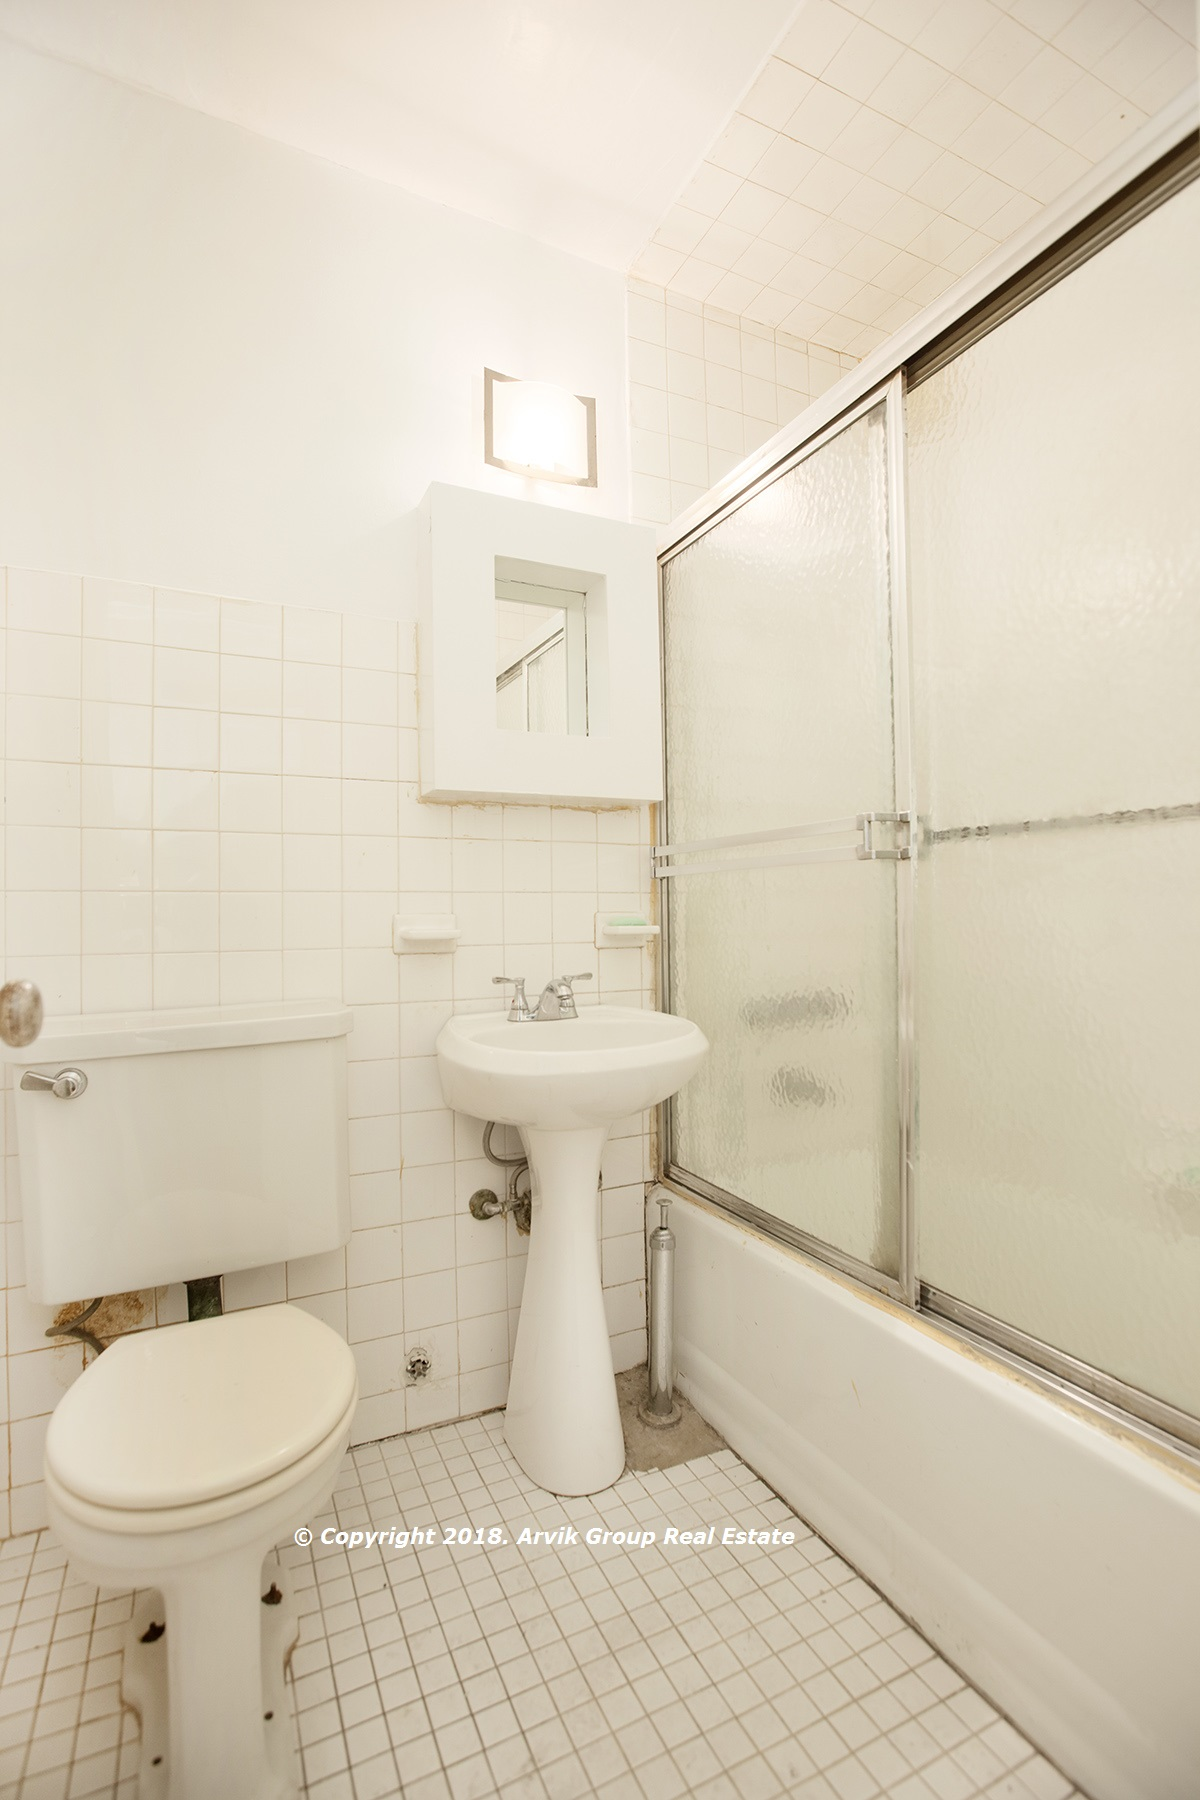 251153299bathroom wm